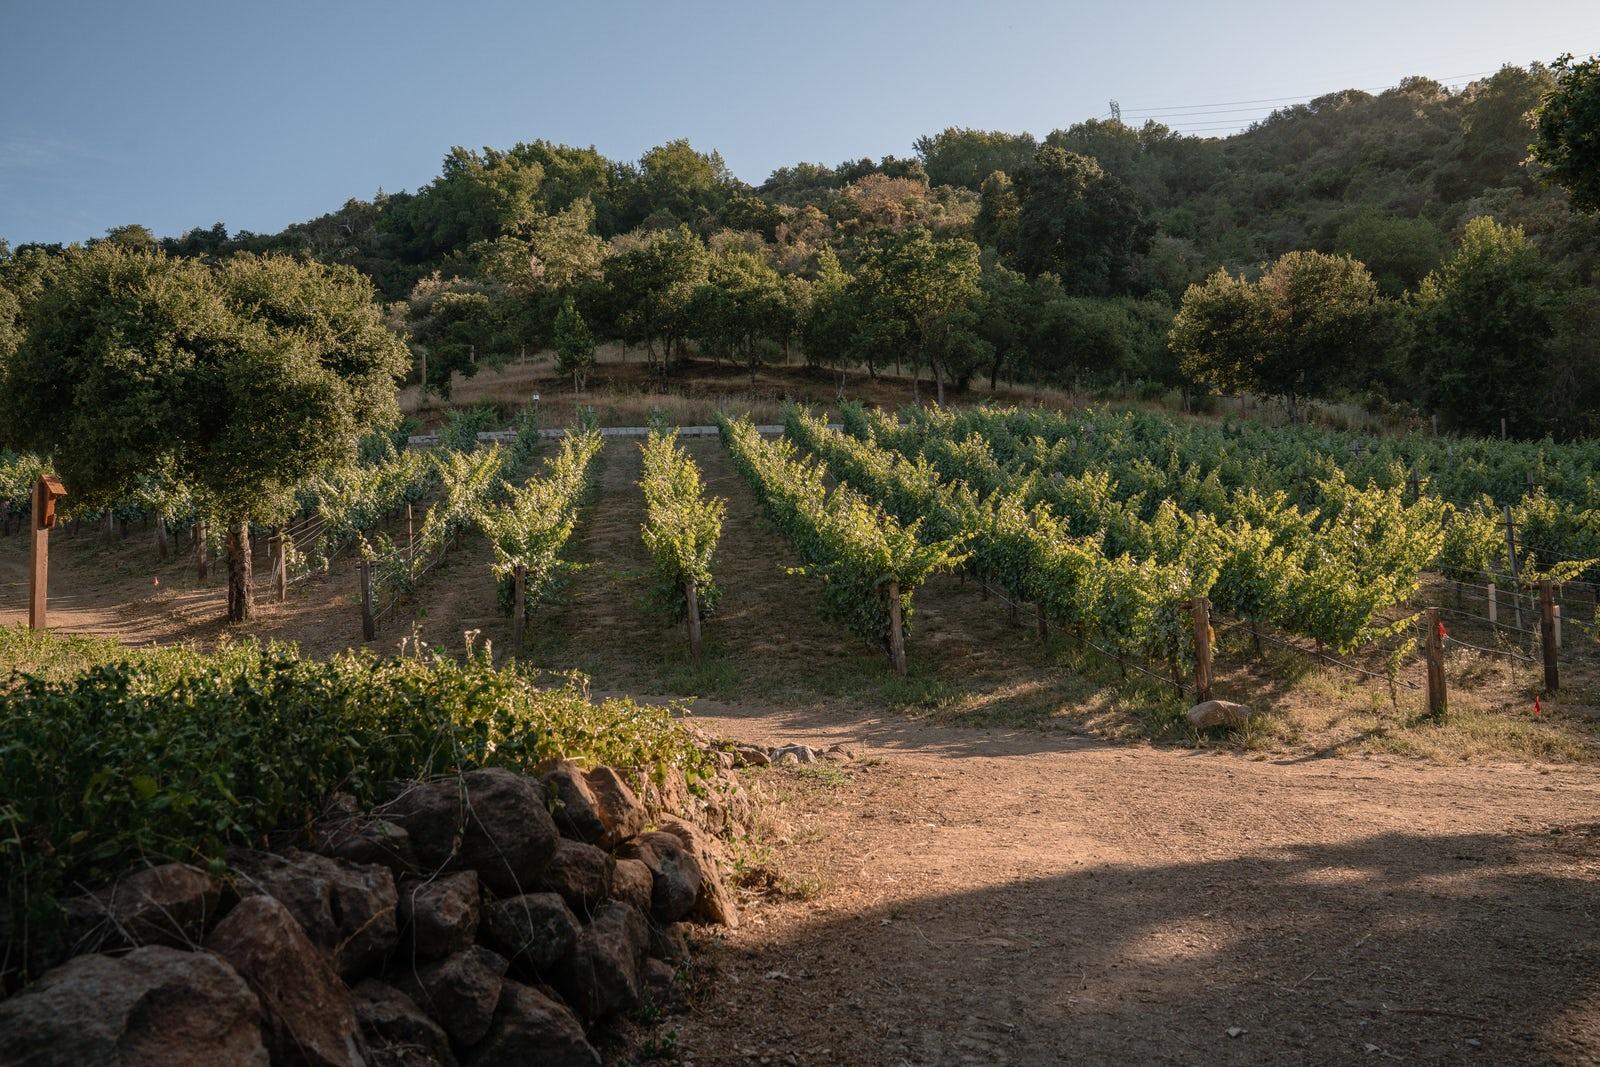 Vineyard and pathway